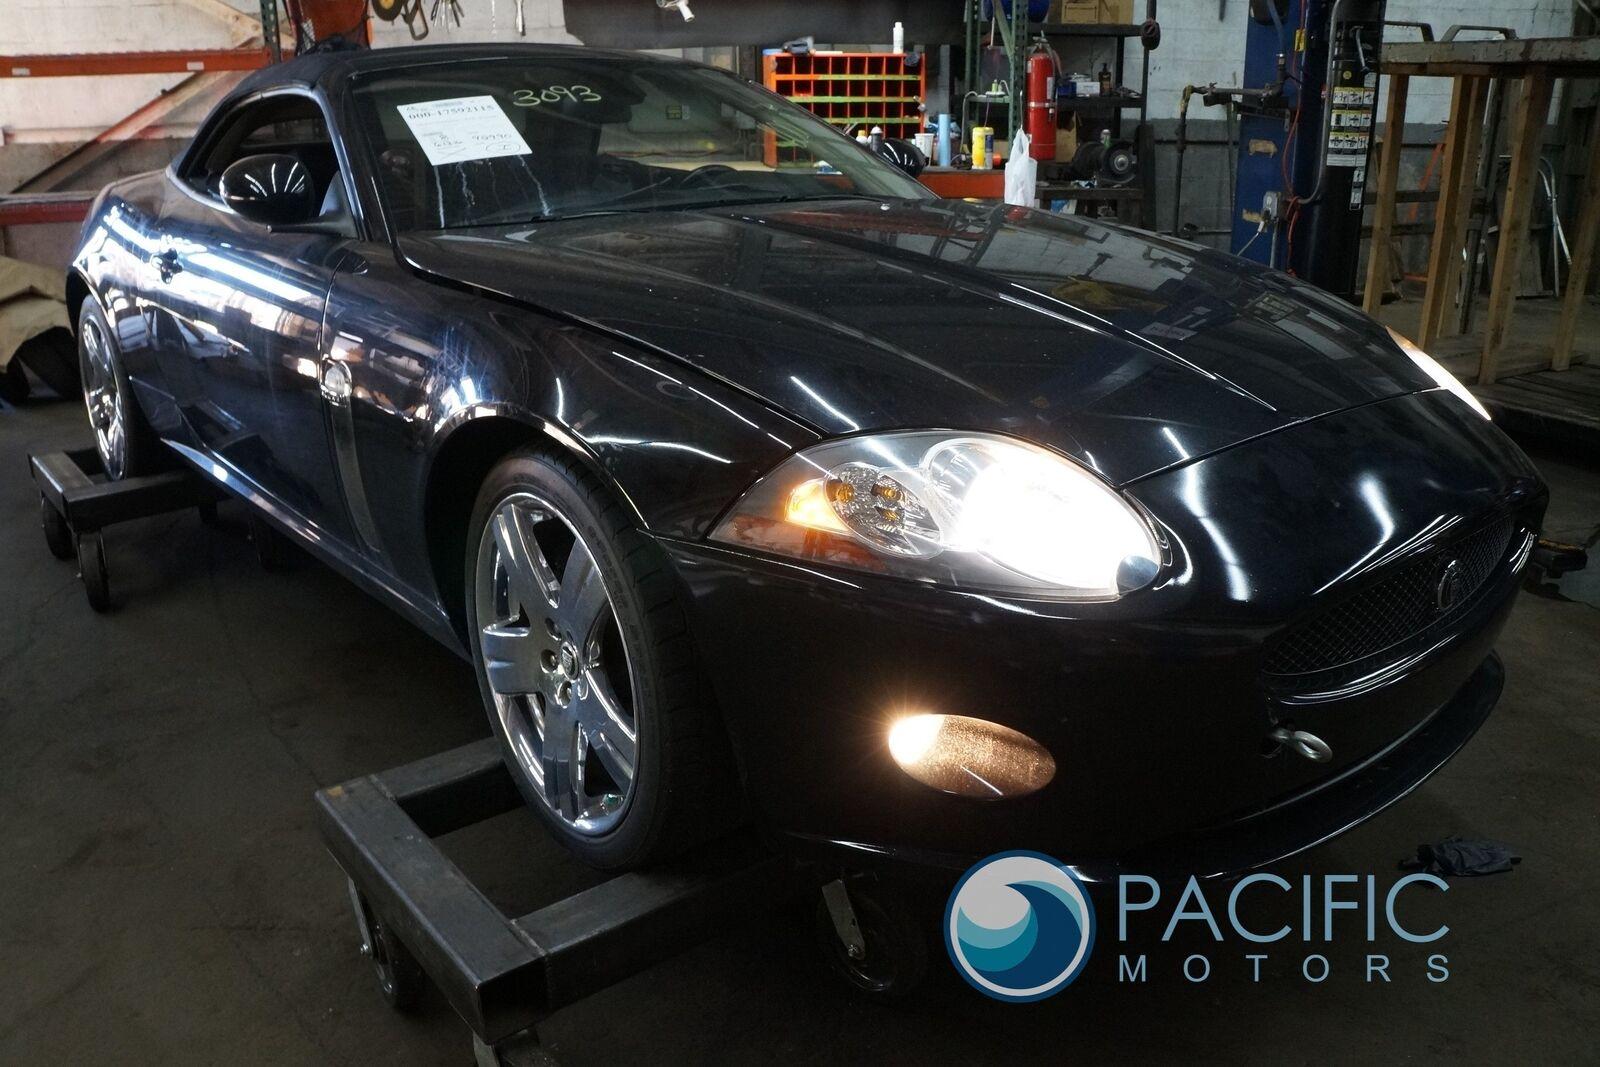 2008 Jaguar Xk Fuse Diagram Electrical Wiring Diagrams 2000 Xk8 Box Abs Trusted Convertible Review